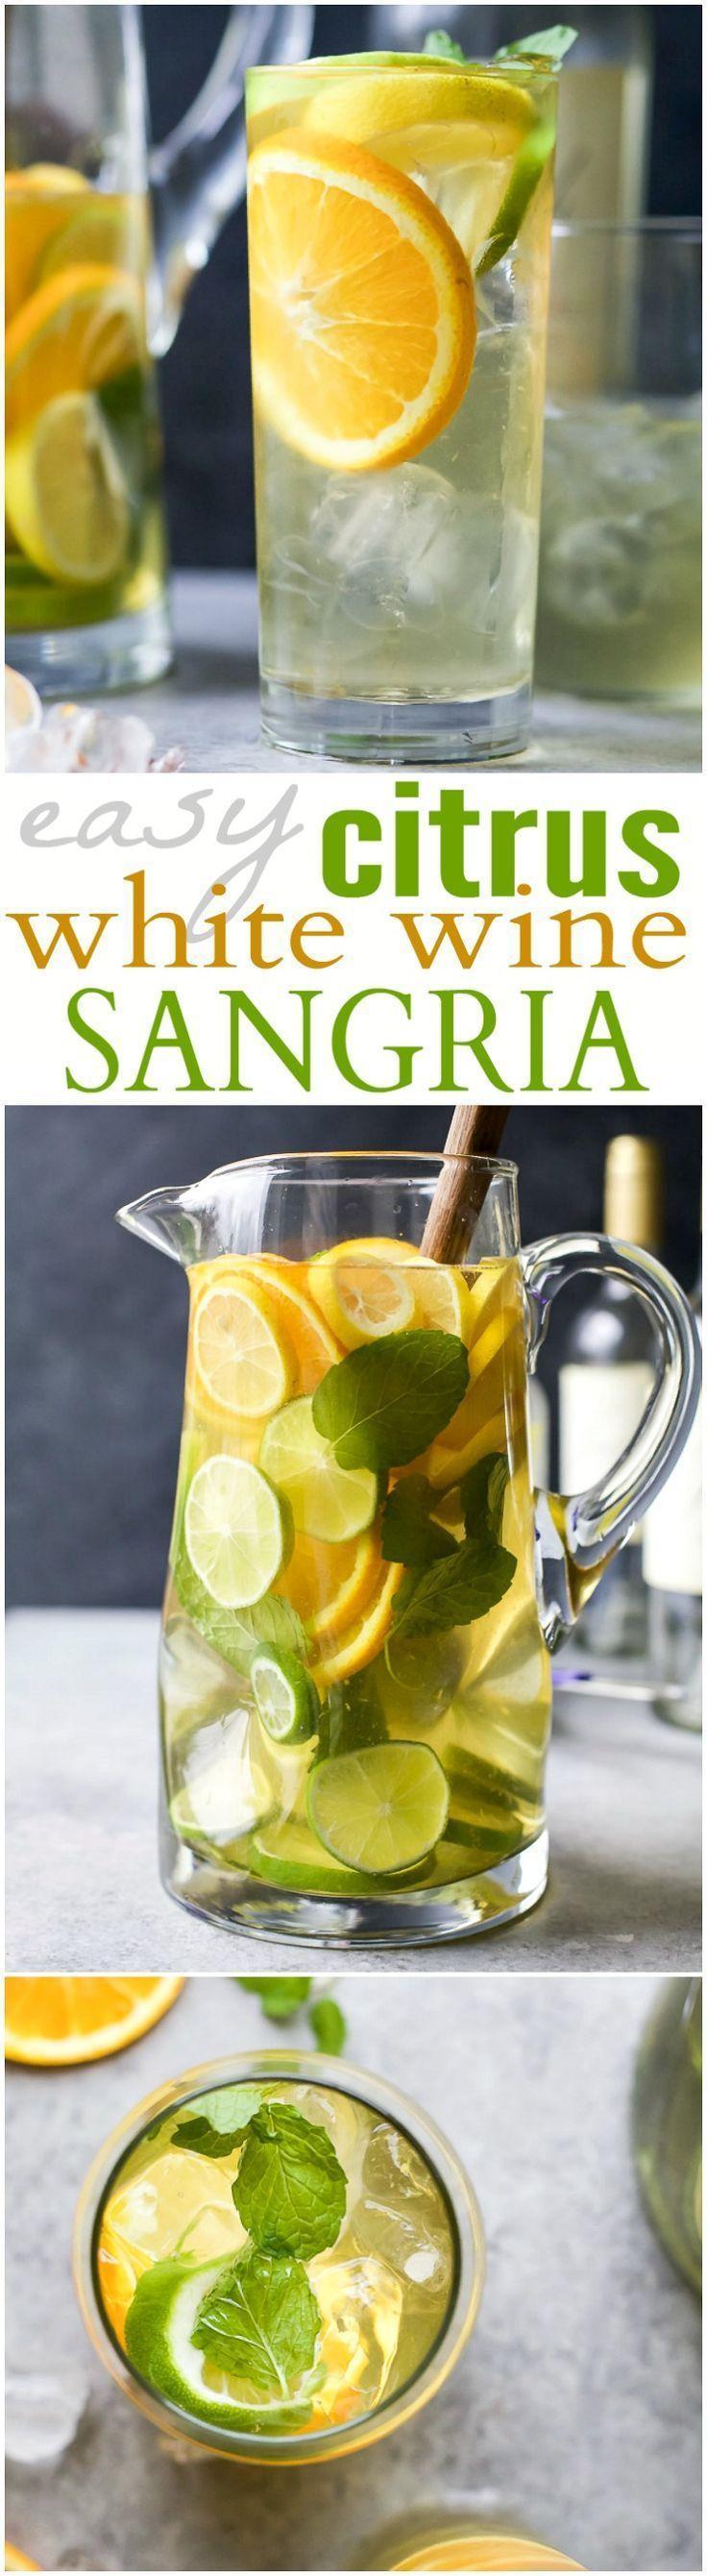 Wedding - Citrus White Sangria